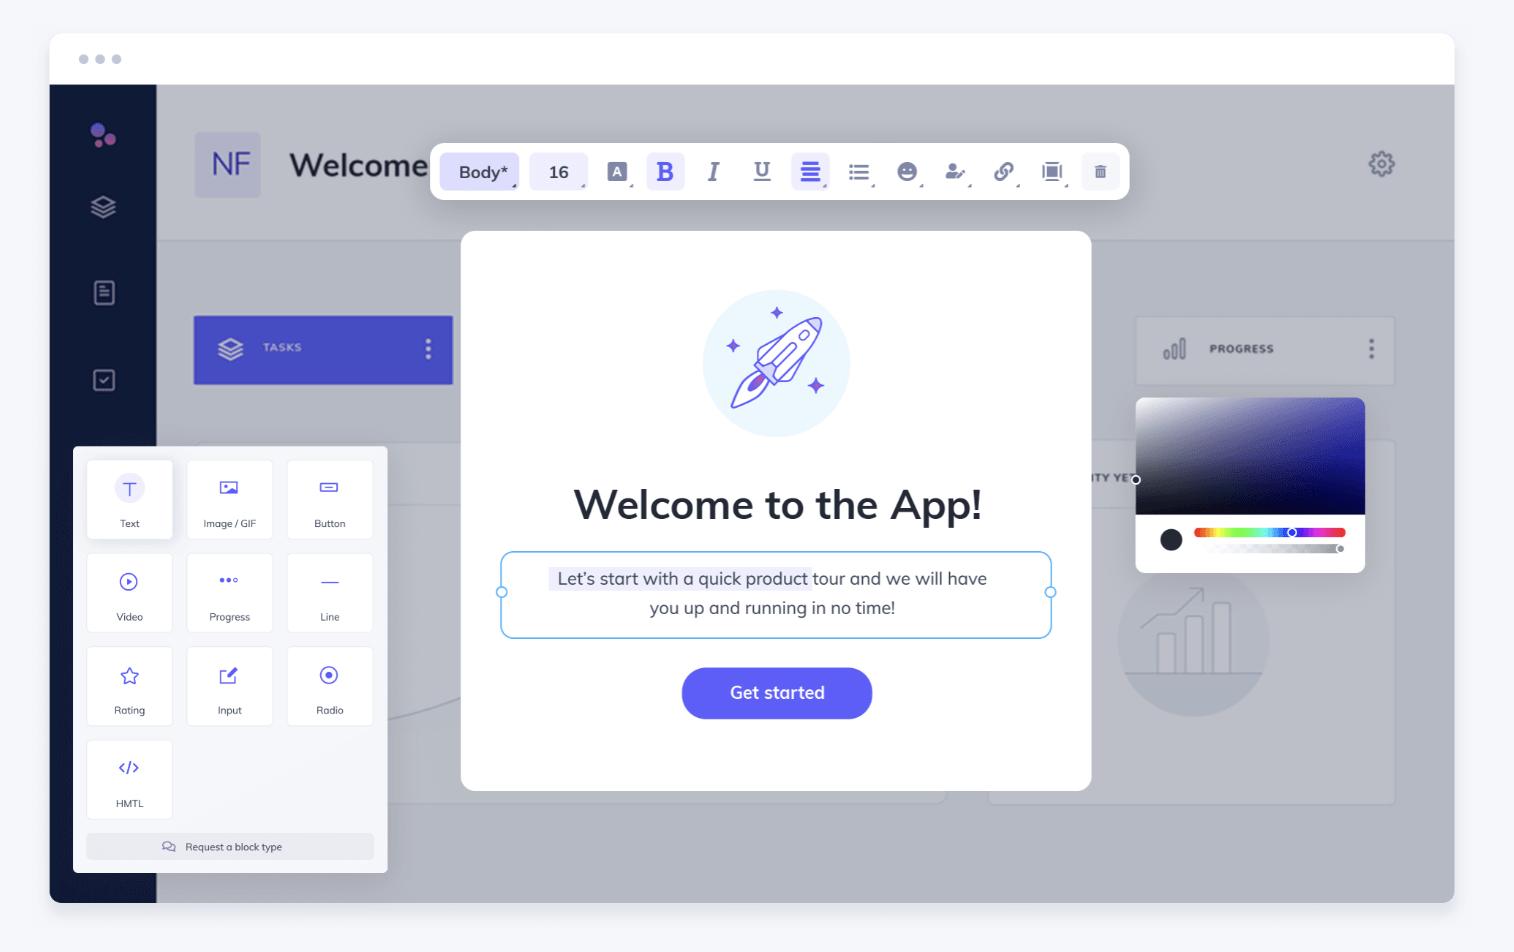 Appcues welcome screenshot